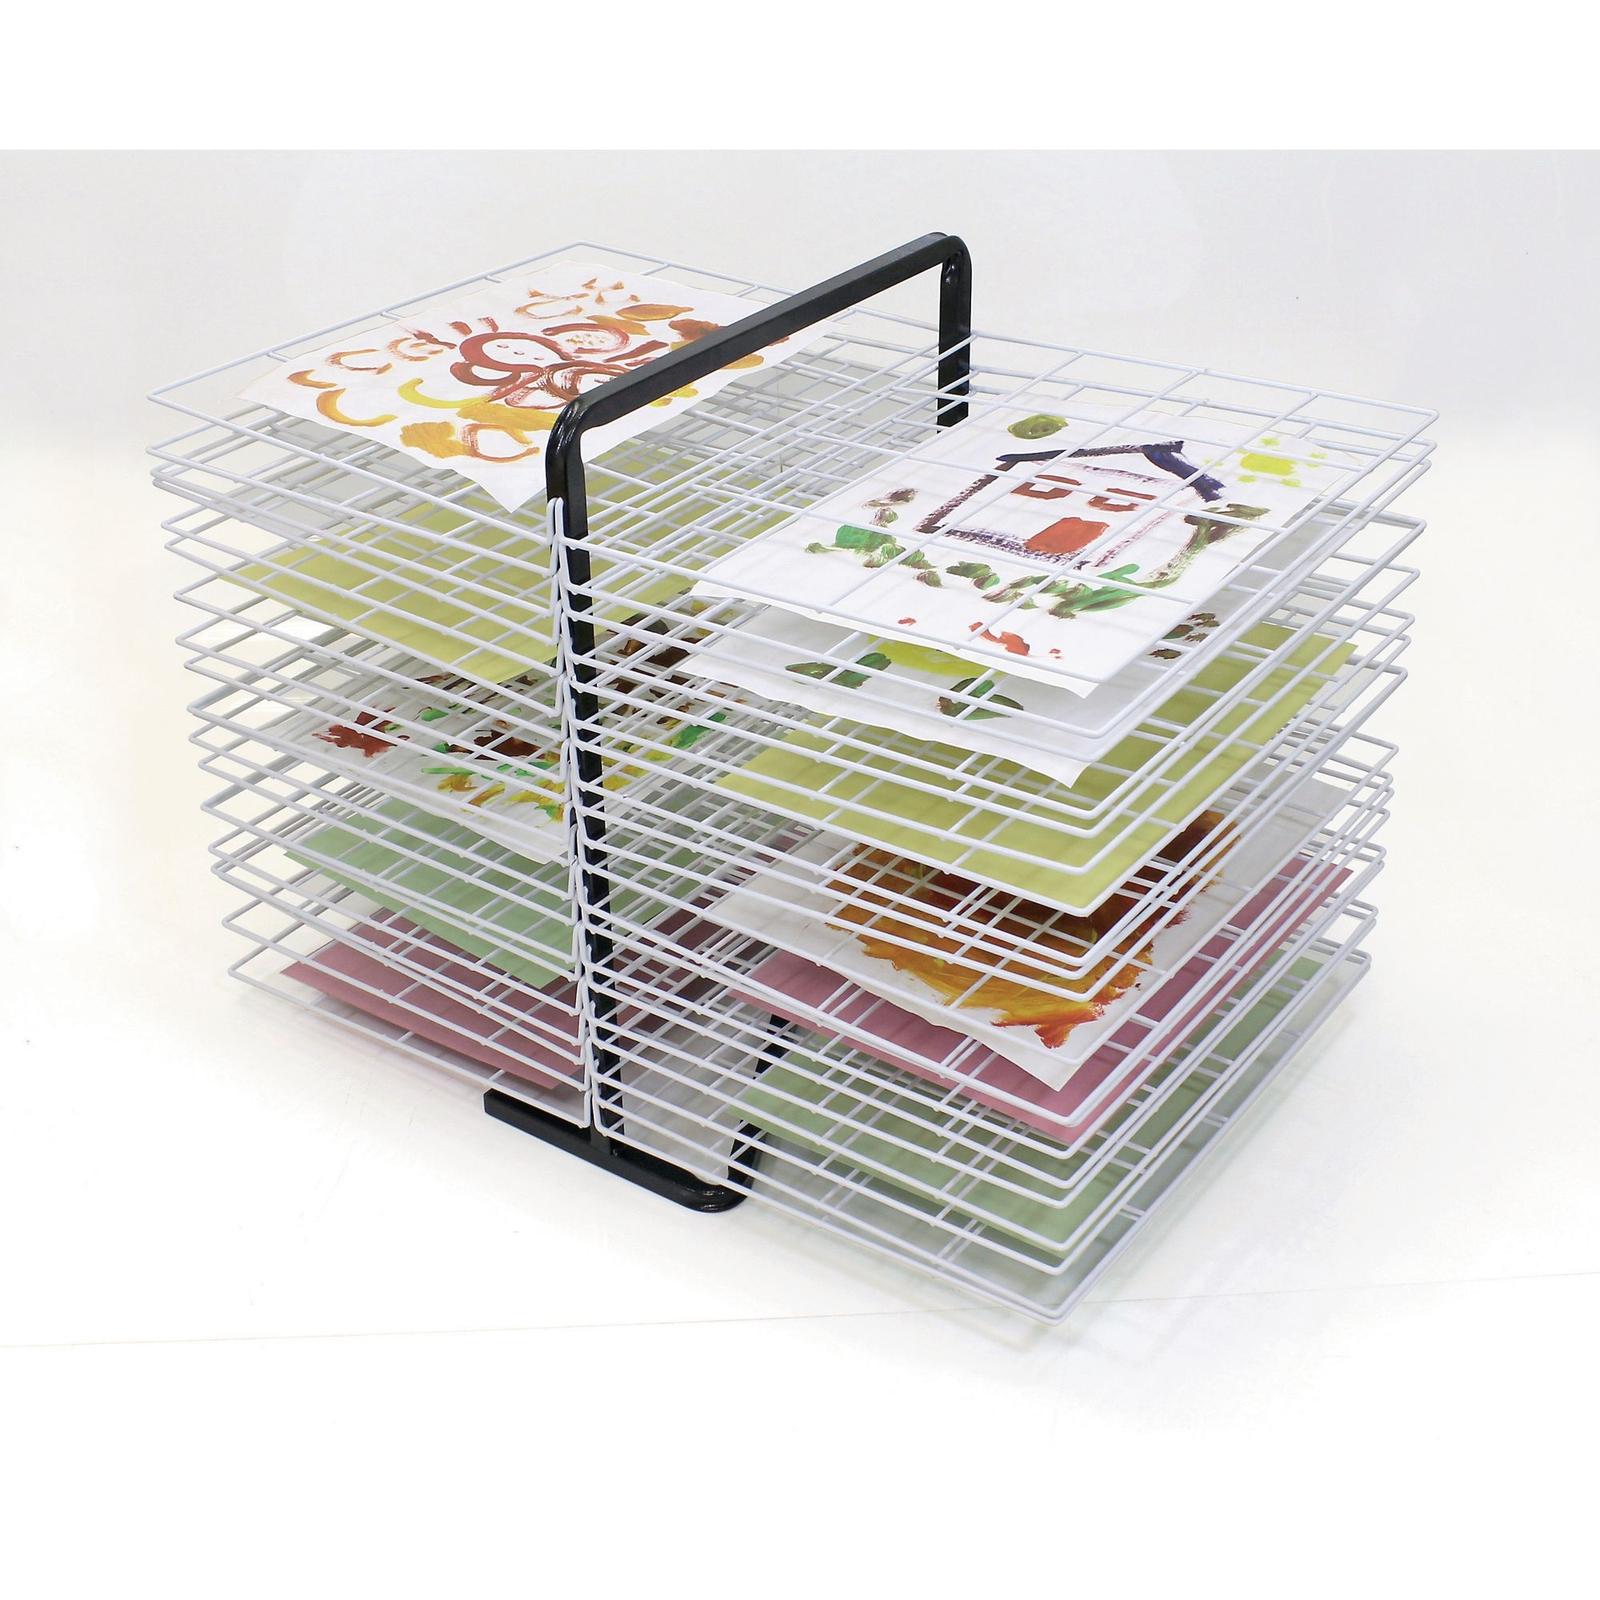 Table Top Dryers - 40 Shelf